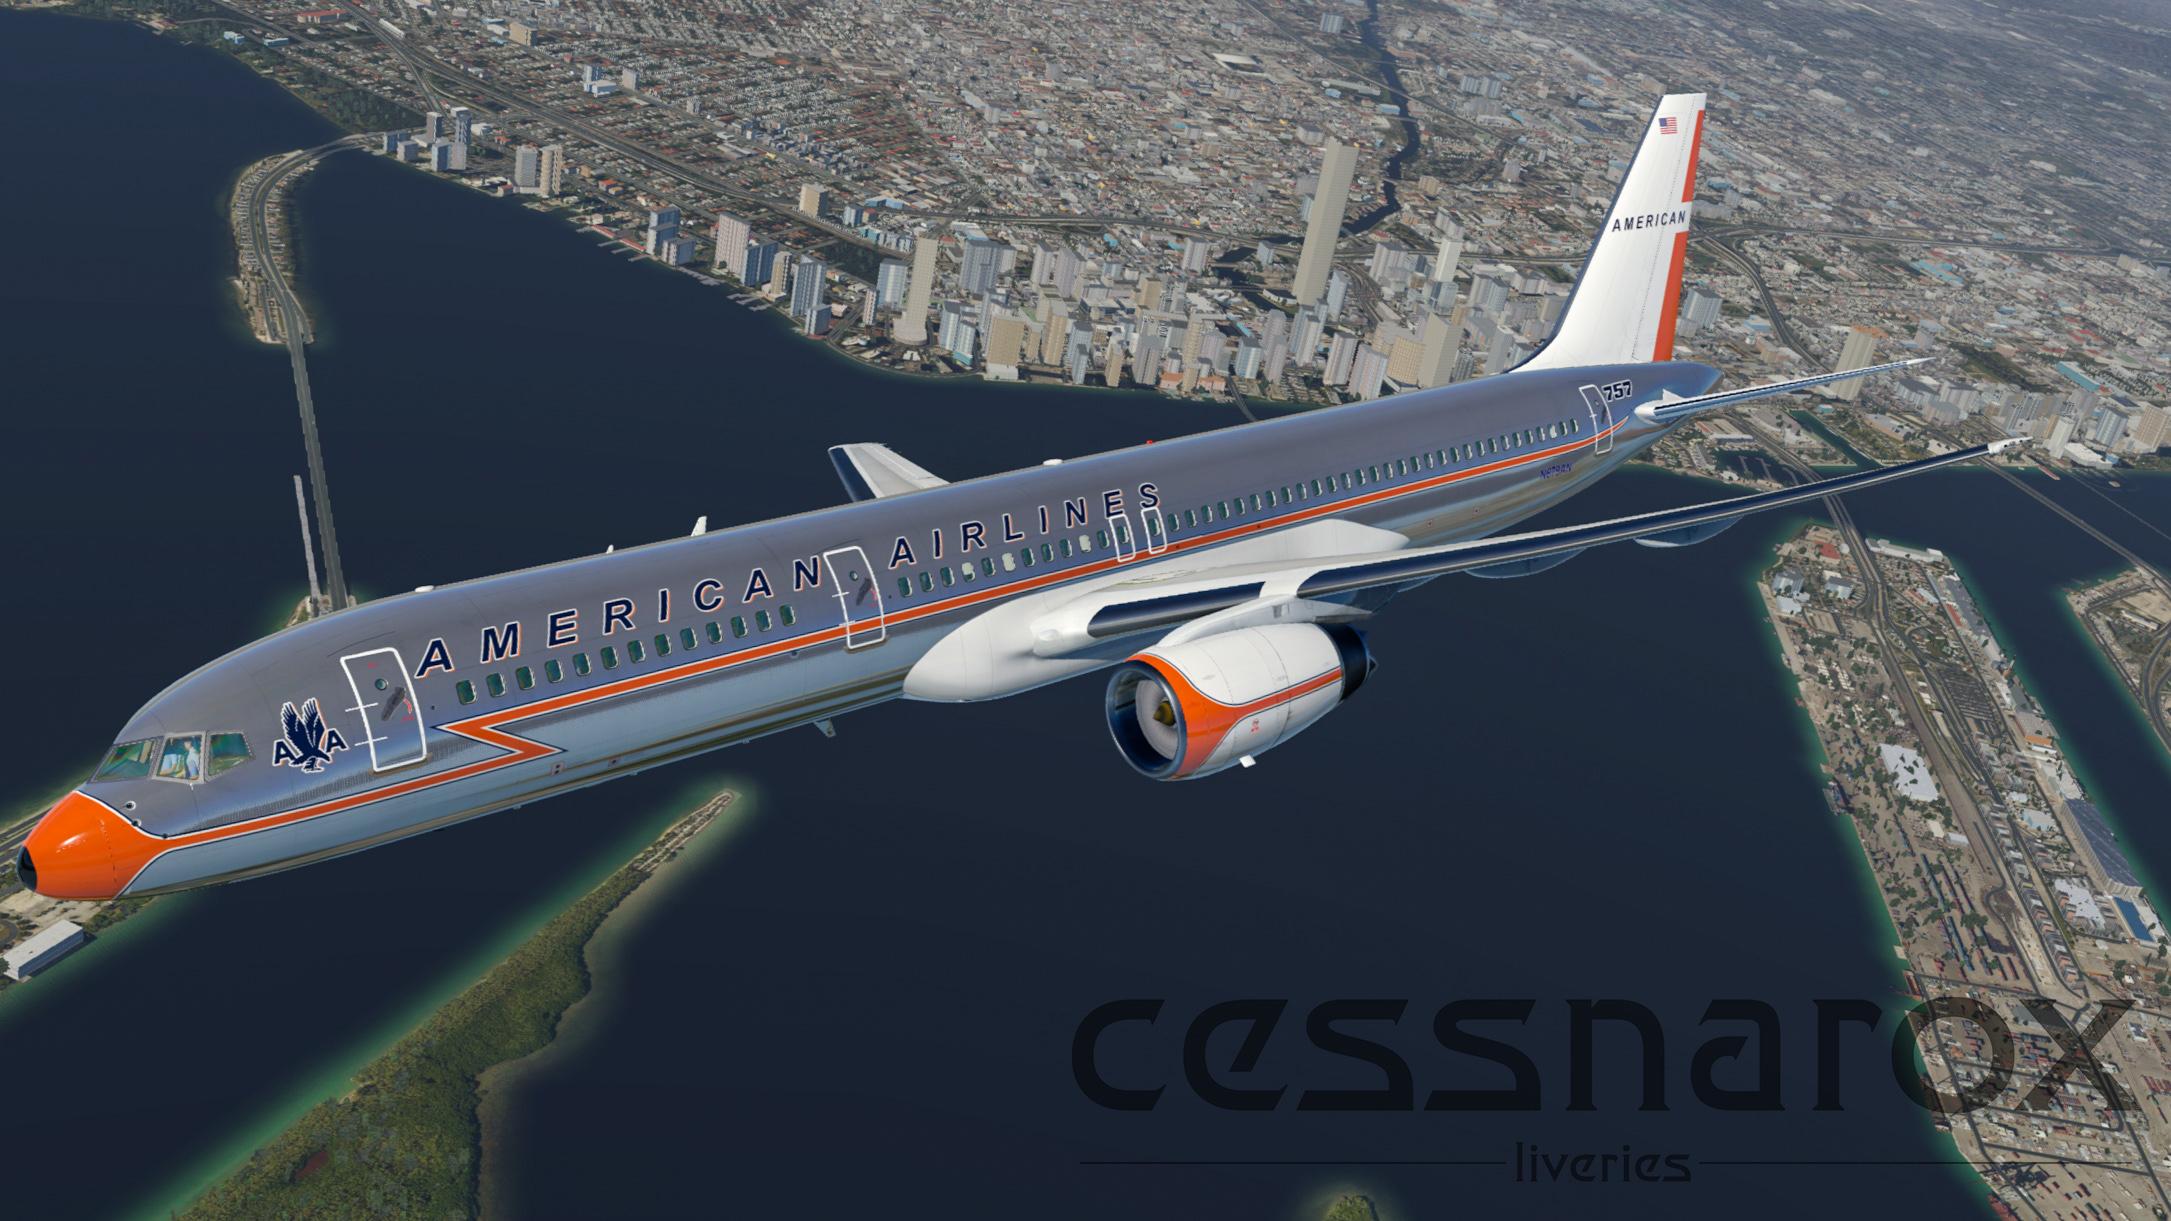 American Airlines (RetroJet) - FlightFactor 757-200v2 Livery